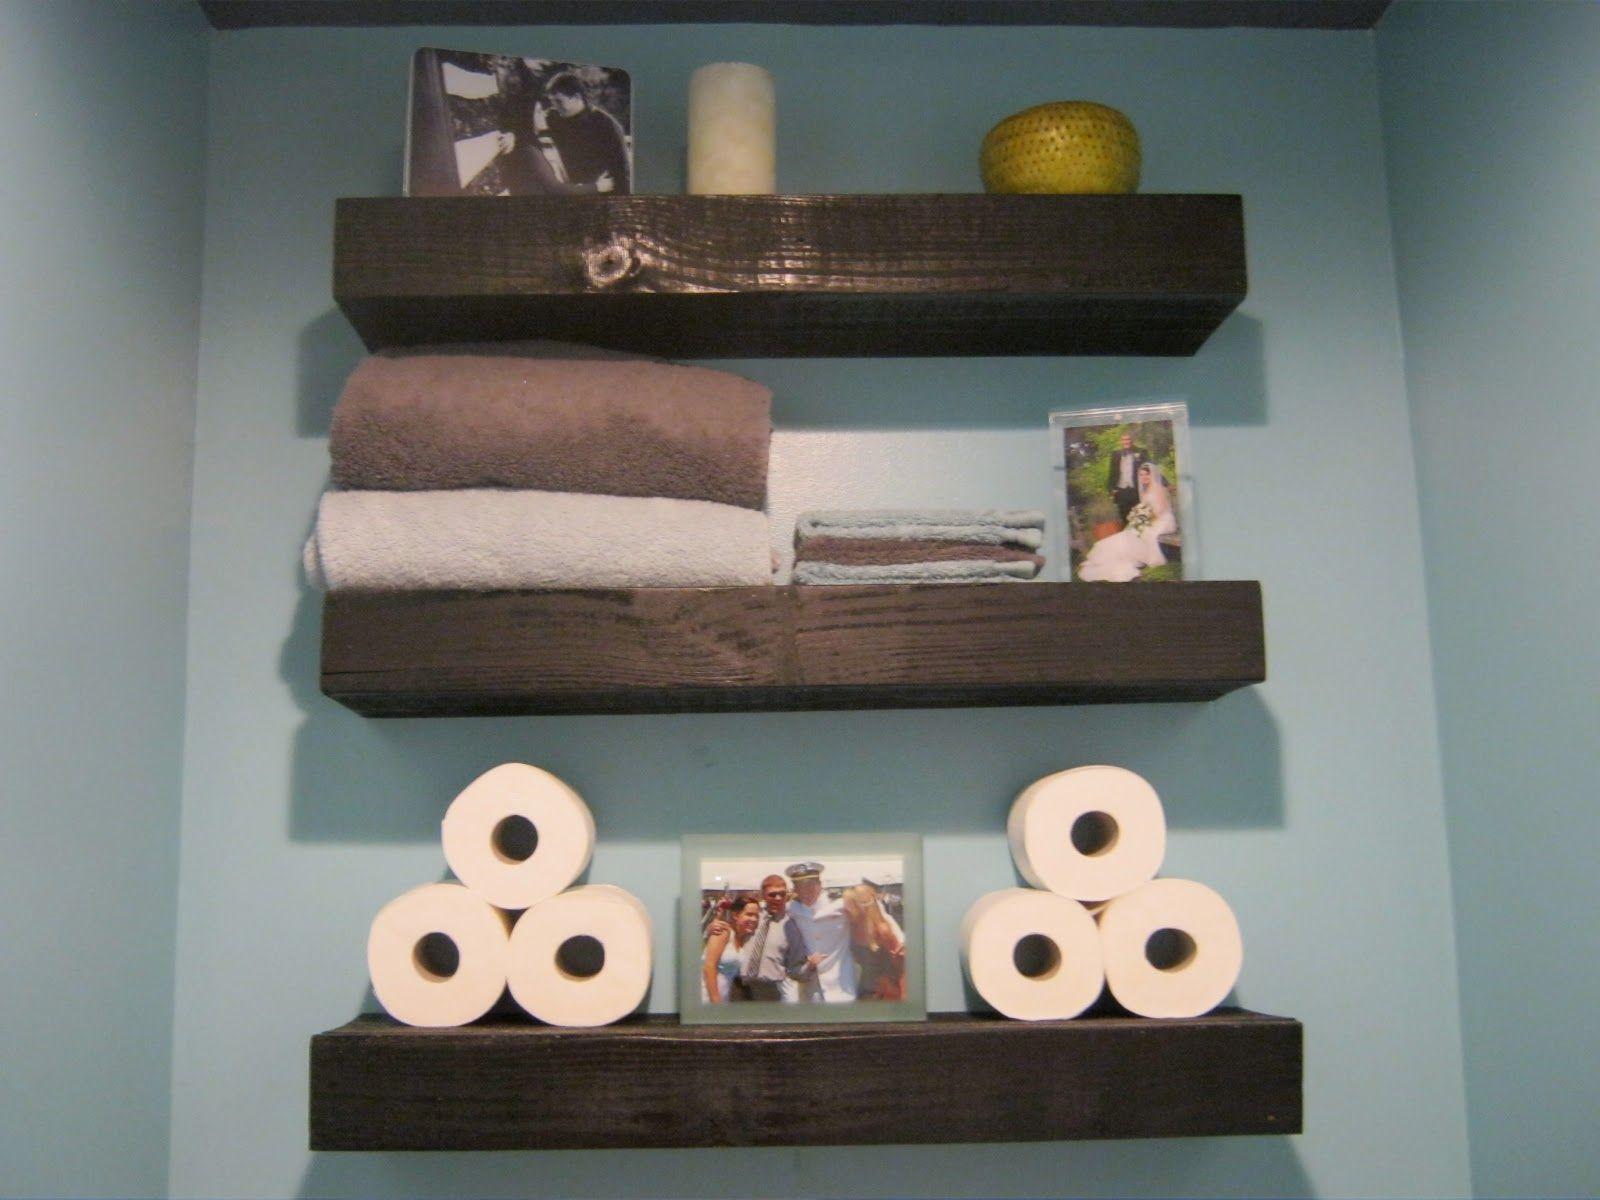 Bathroom Gray And Dark Wood Palette Pallet Wood Floating Shelves Wood Floating Shelves Floating Shelves Diy Floating Shelves